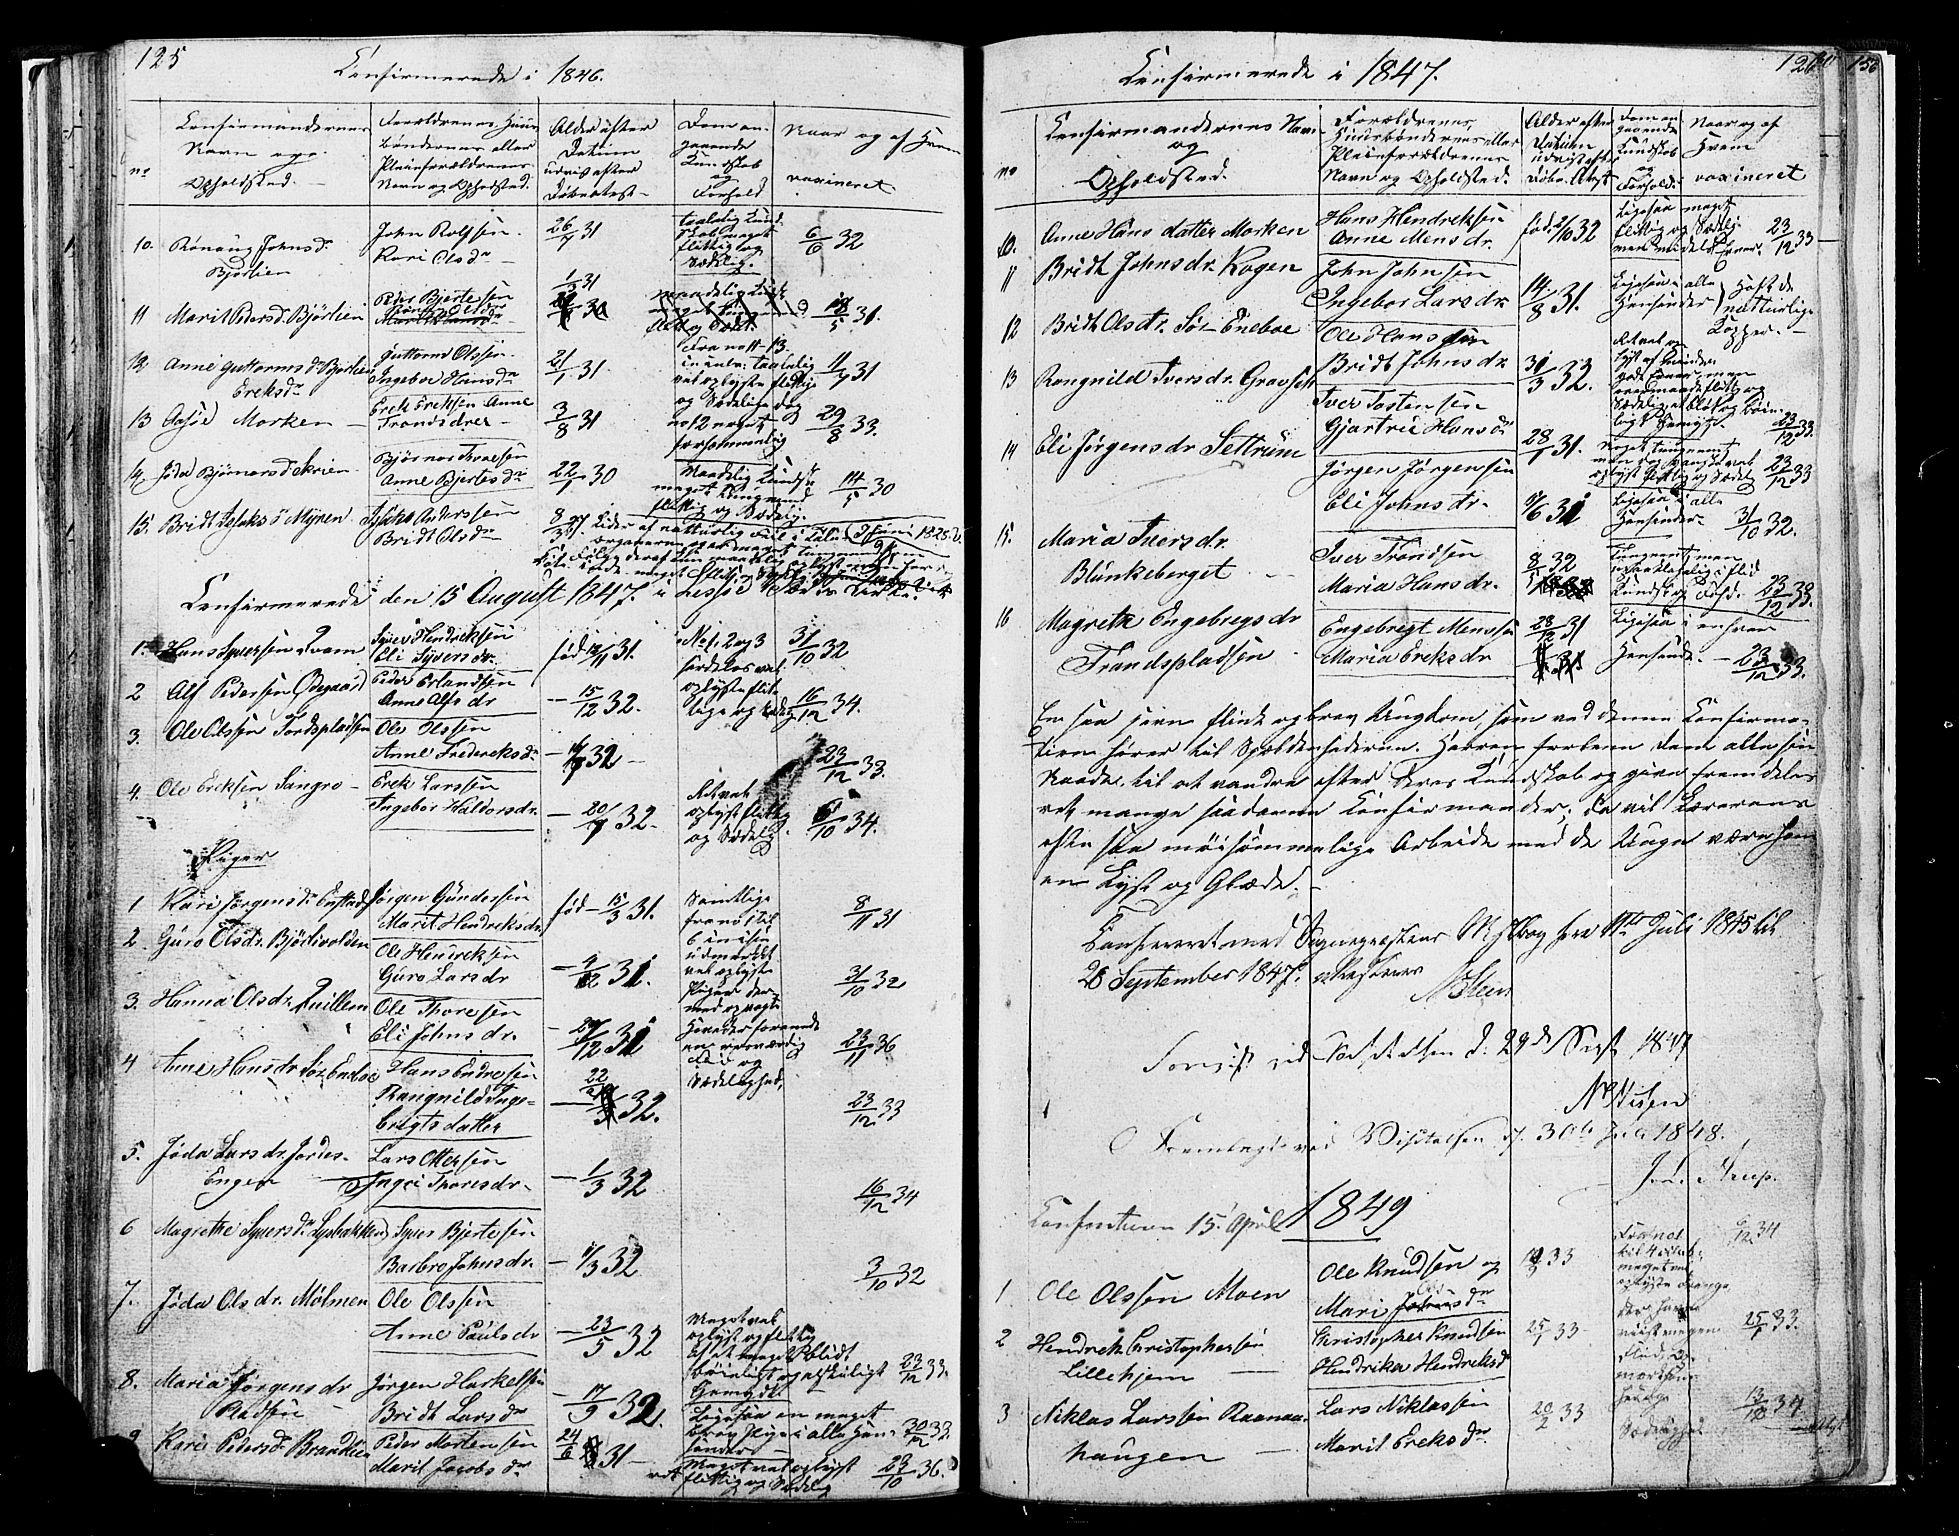 SAH, Lesja prestekontor, Klokkerbok nr. 4, 1842-1871, s. 125-126